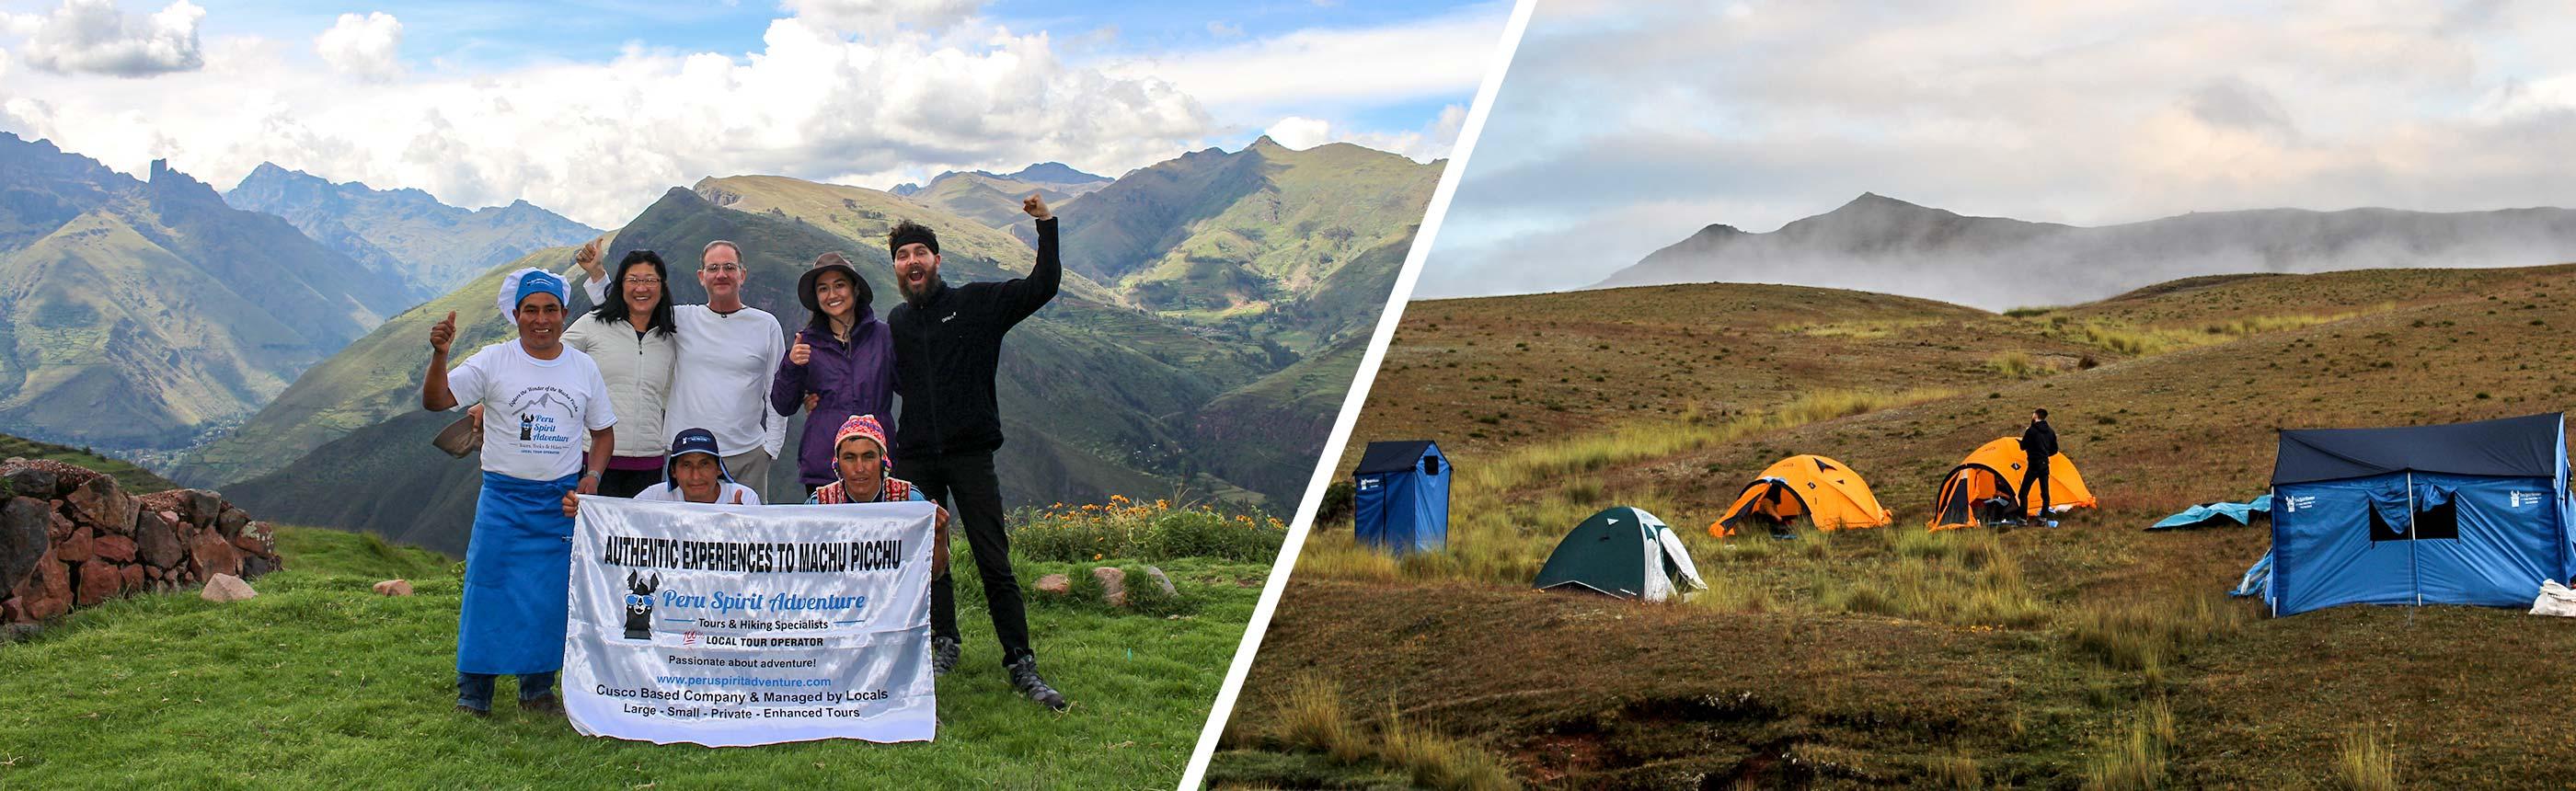 Huchuy Qosqo Trek to Machu Picchu with Camping